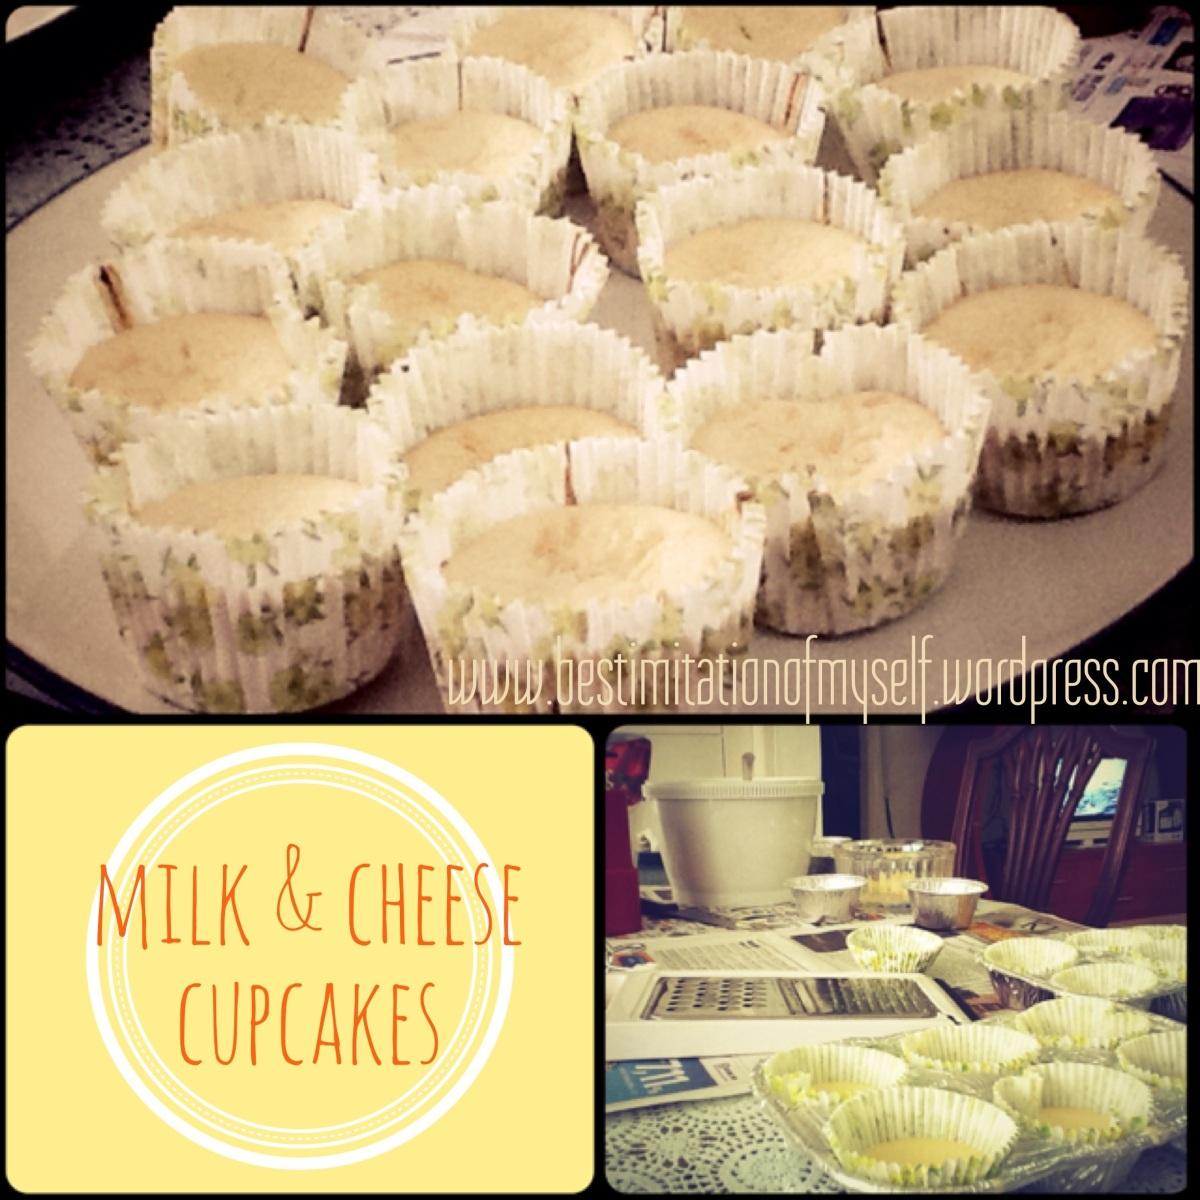 (LatePost) Milk & CheeseCupcakes